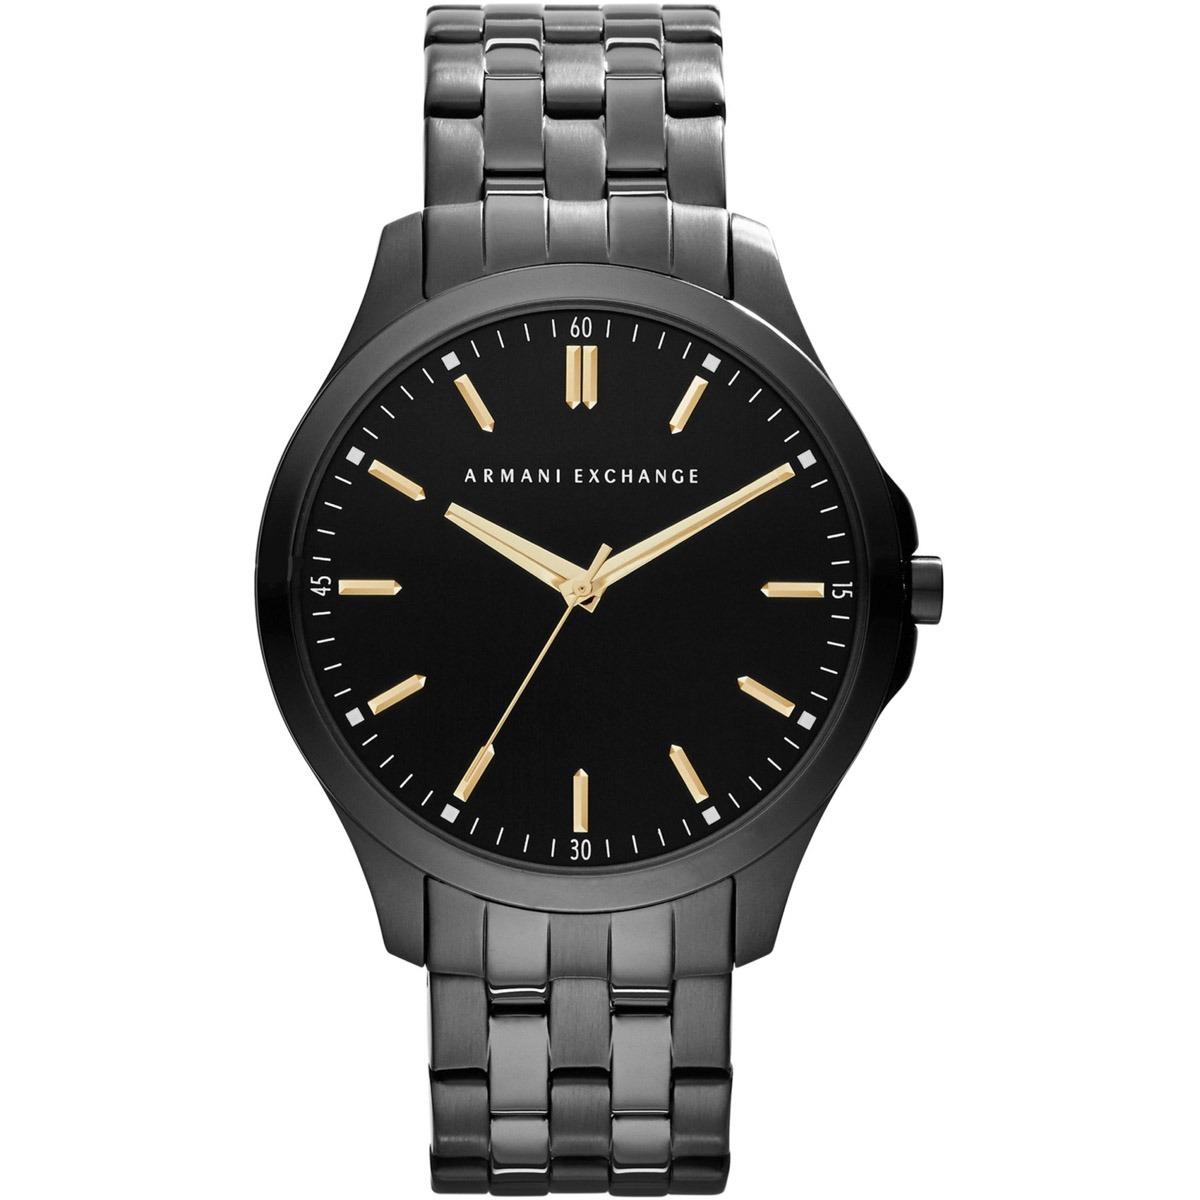 fd4a06199b5 relógio armani exchange masculino analógico ax2144 1pn. Carregando zoom.